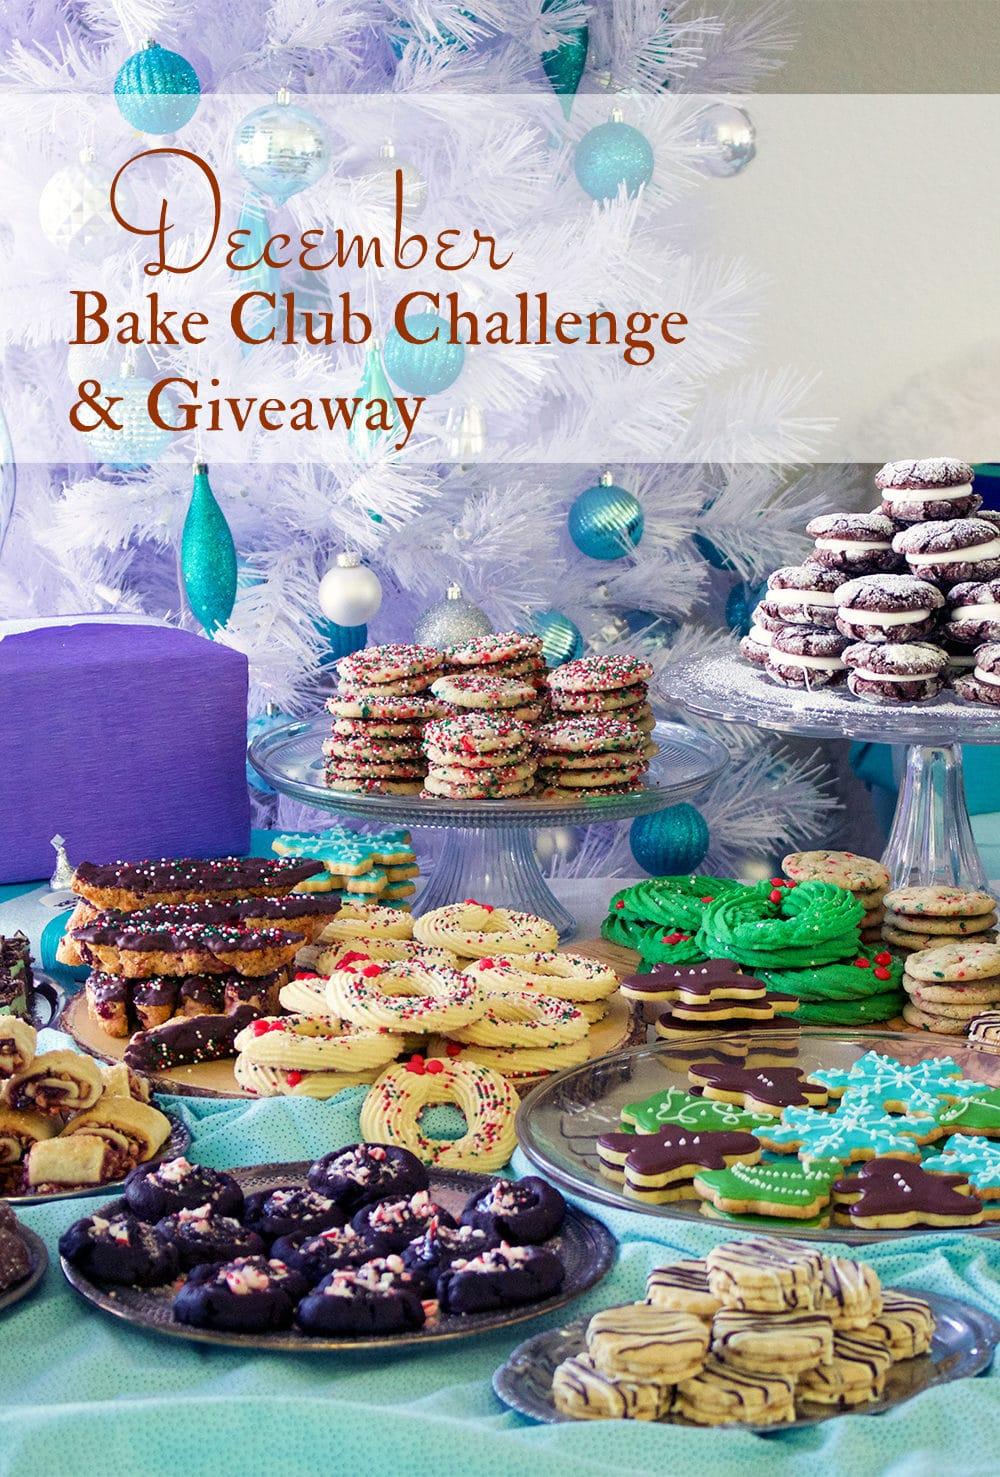 The December Bake Club Baking Challenge Recipe is Christmas Cookies